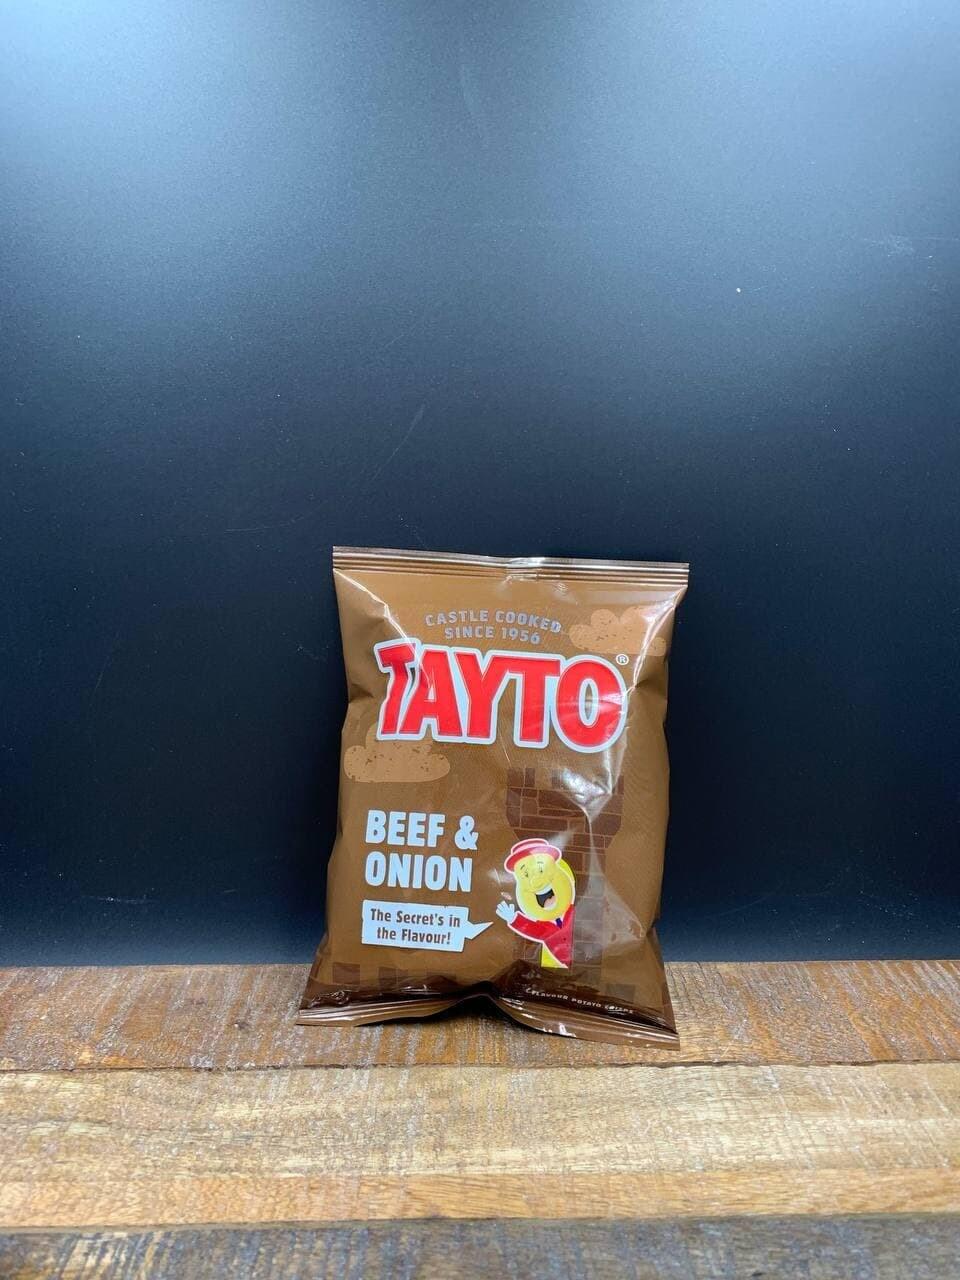 Tayto Beef & Onion 37.5g